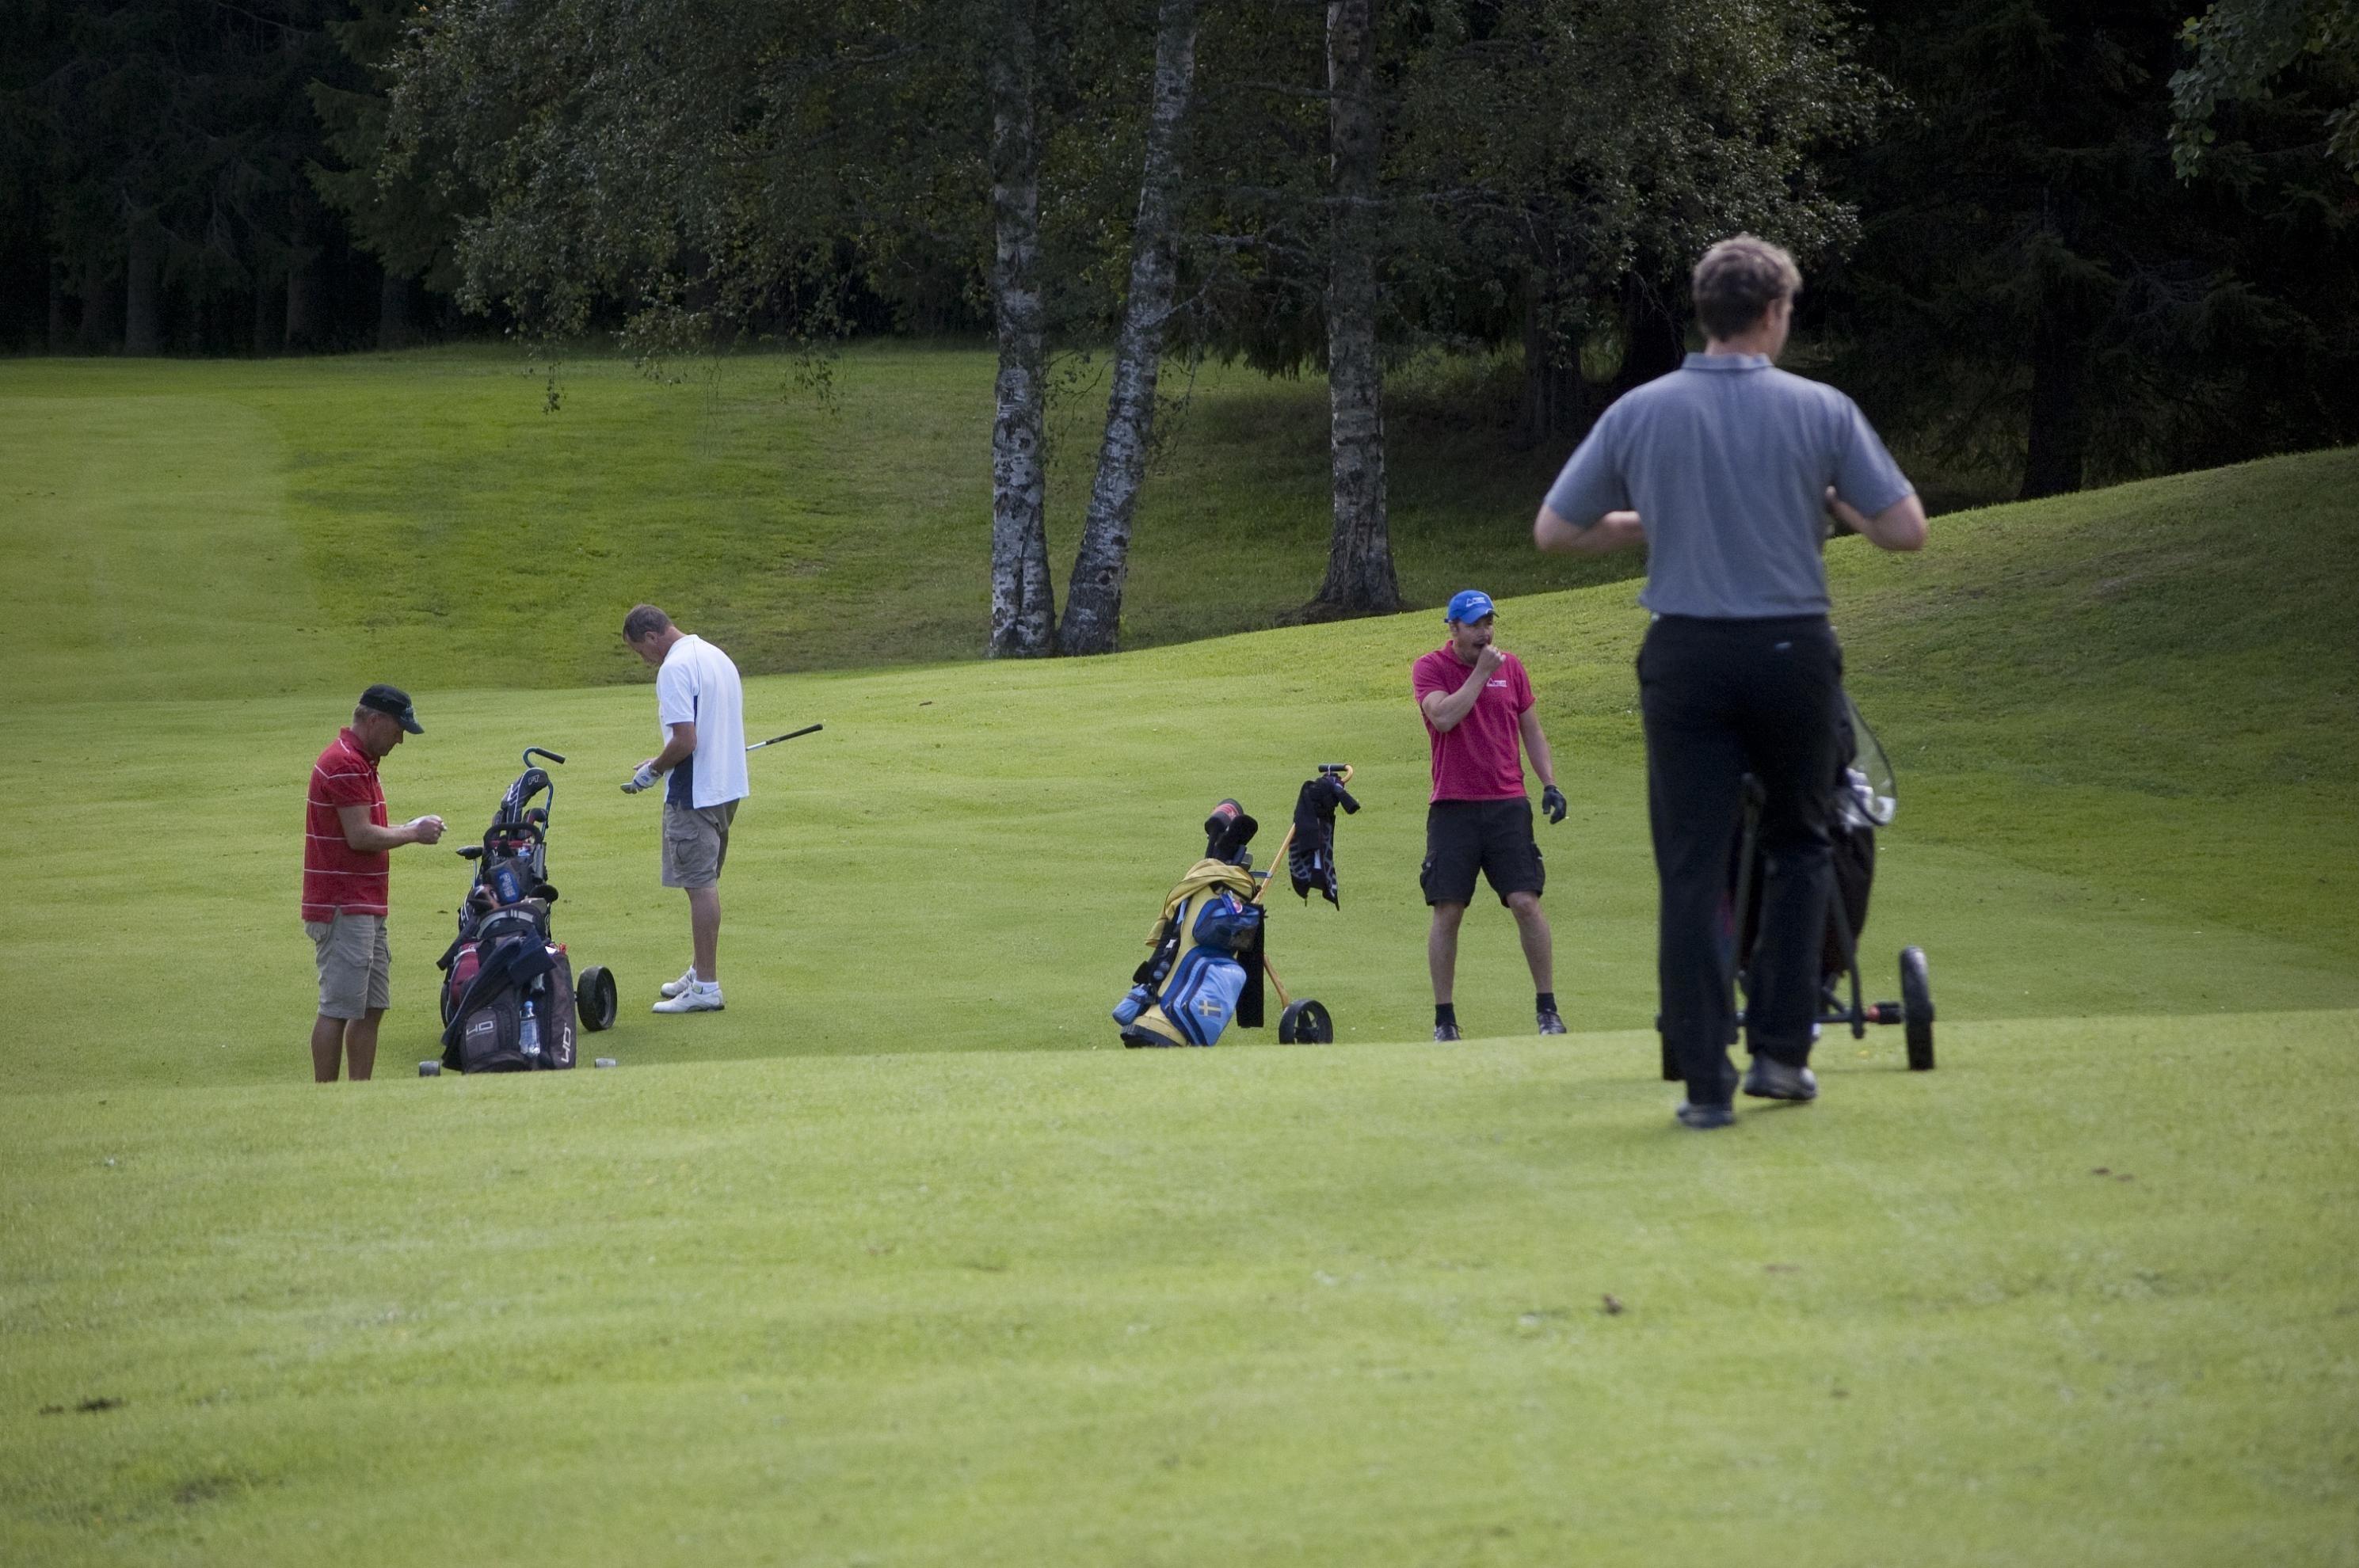 Foto: Lennart Angermund, Sollefteå Golfbana i Österforse